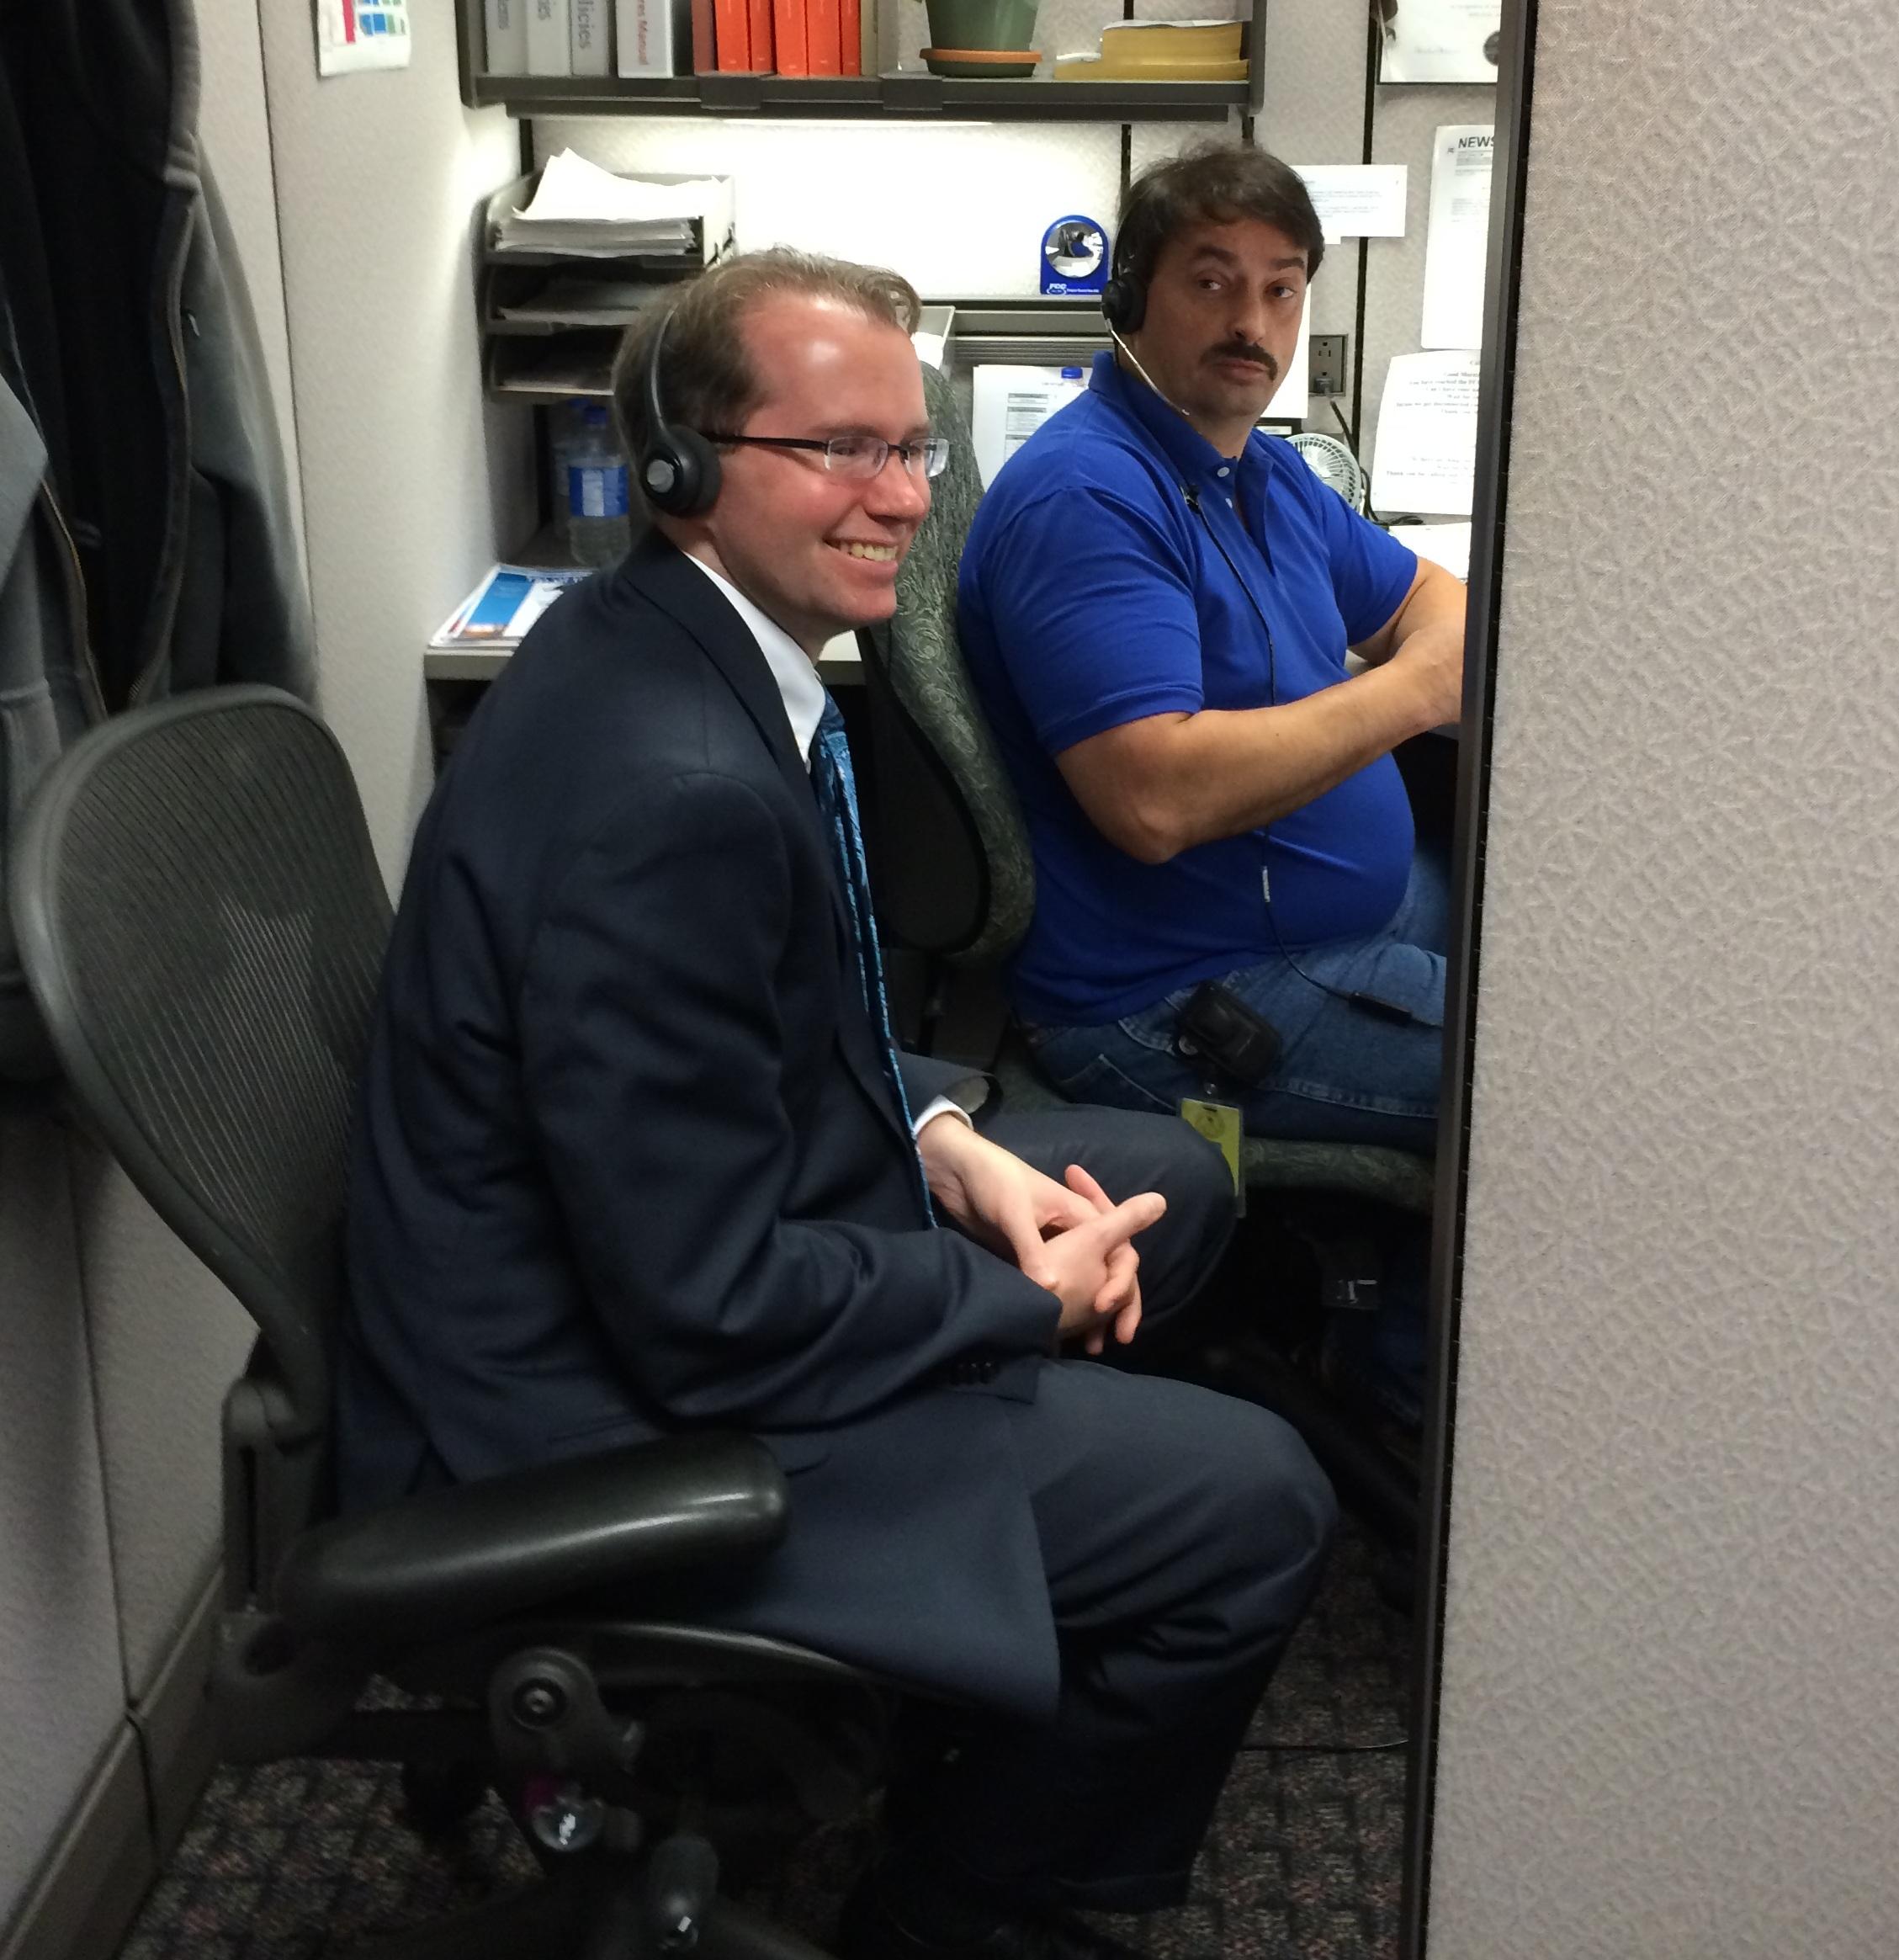 David Bray visit to FCC's Gettysburg Facility